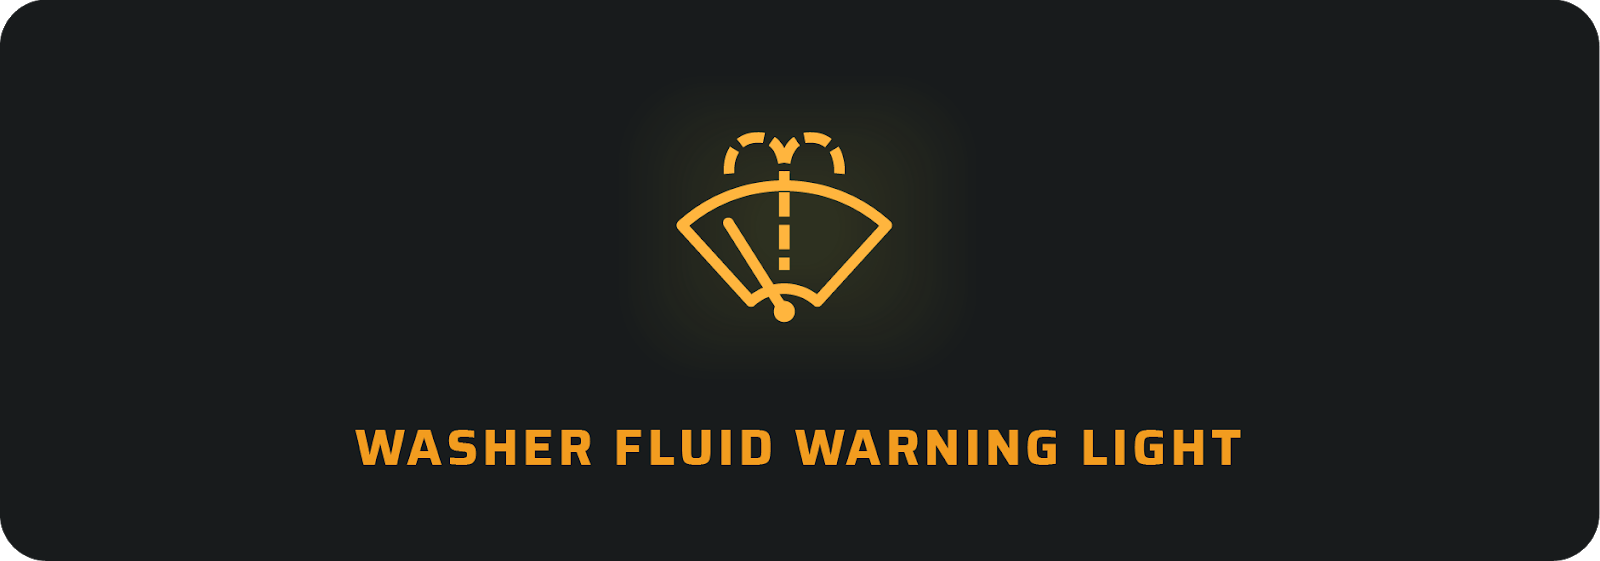 Car warning lights: Washer fluid